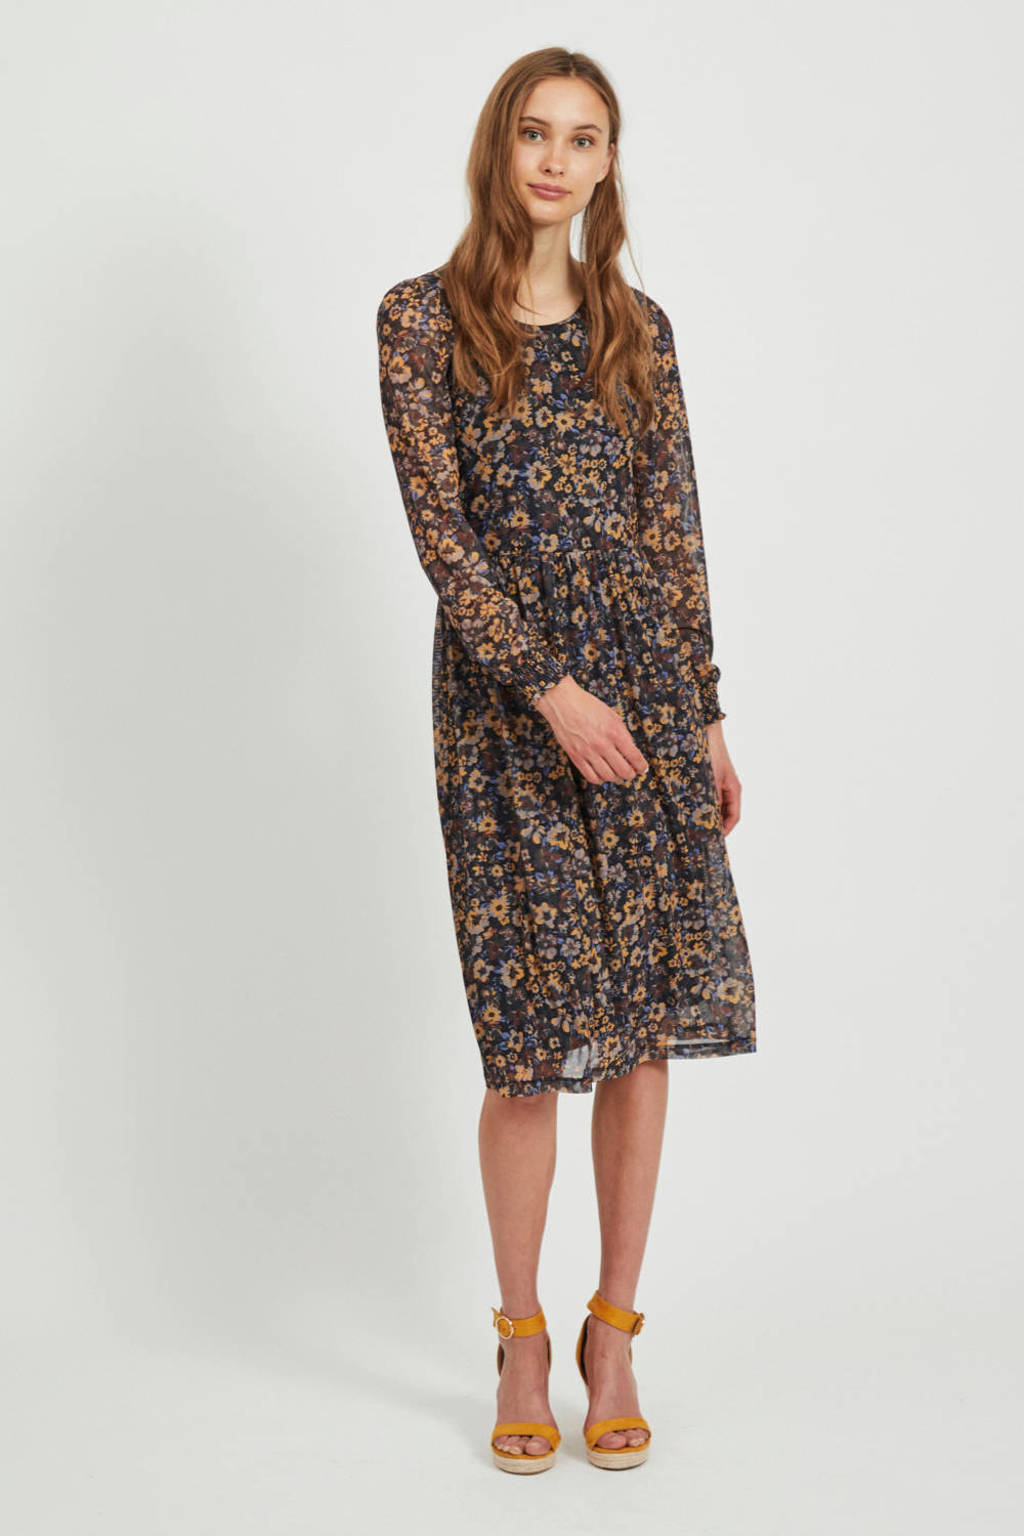 VILA semi-transparante jurk Violette met all over print en plooien zwart/multi, Zwart/multi